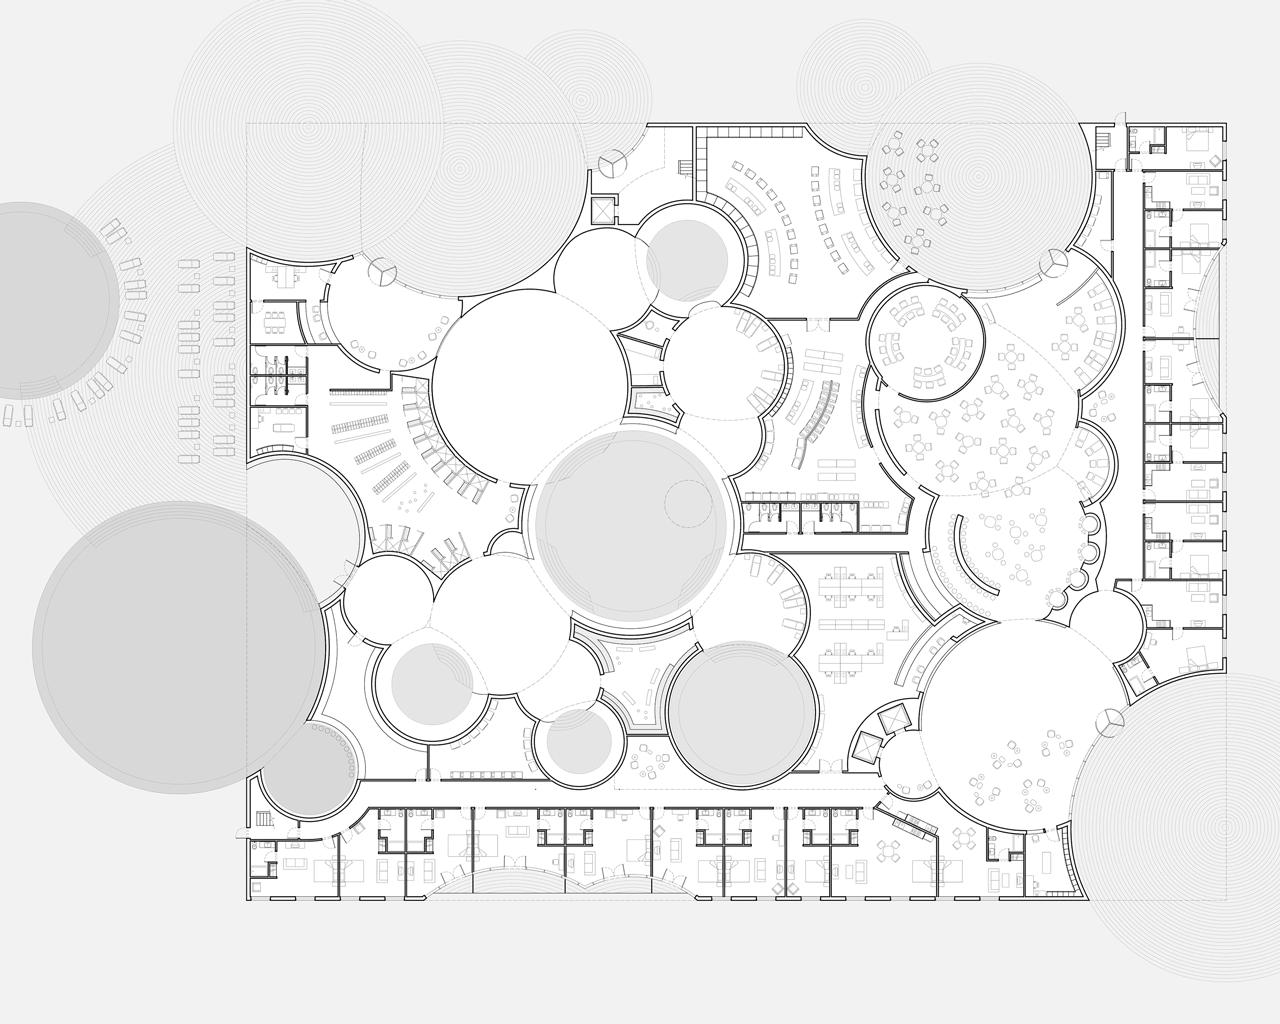 steven-christensen_bubble-bath_plan_level1_1280.png